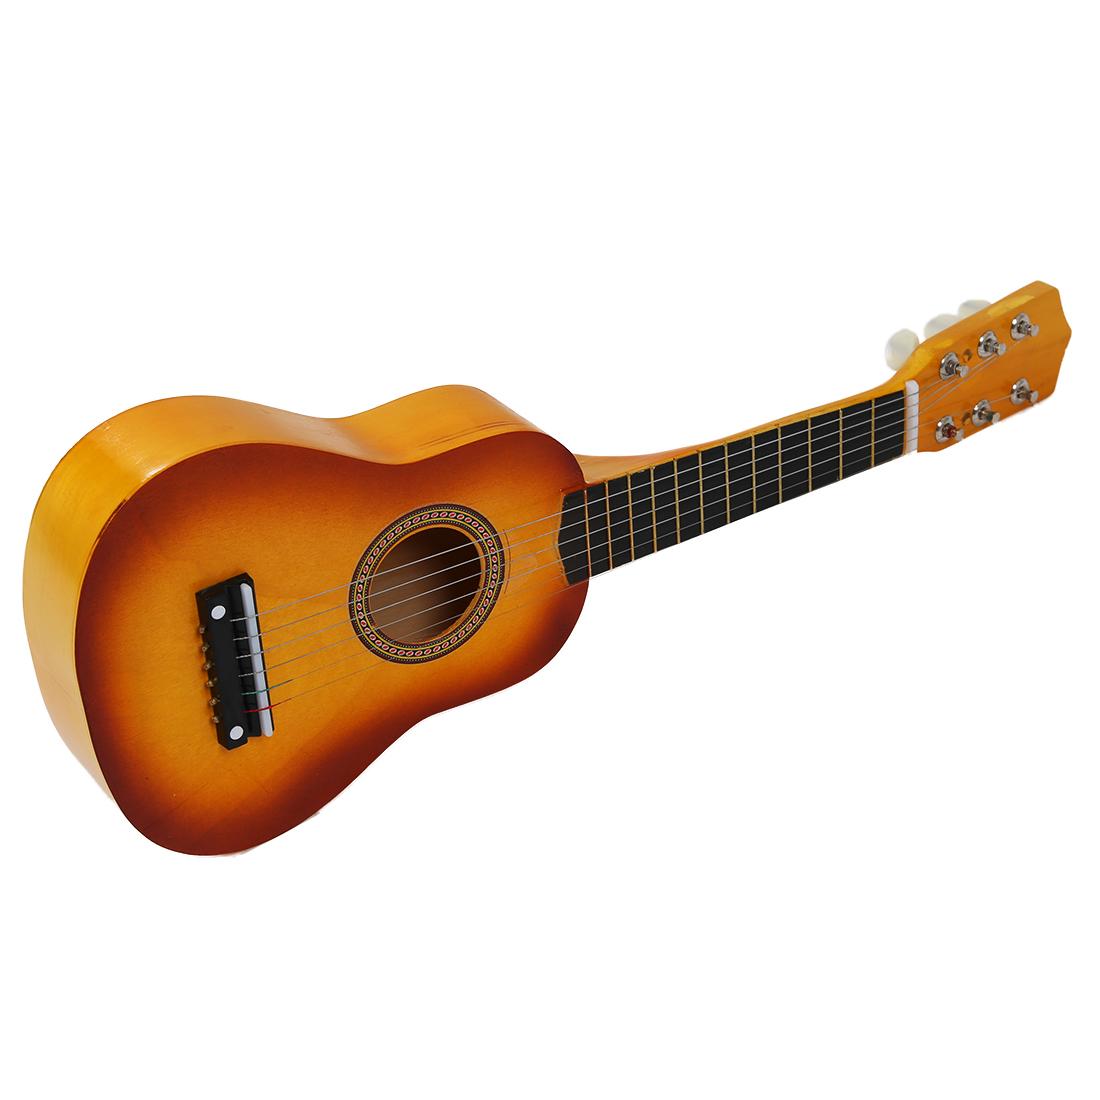 hawaii ukulele mini guitar 21 inch acoustic ukulele plectron j1m5 ebay. Black Bedroom Furniture Sets. Home Design Ideas